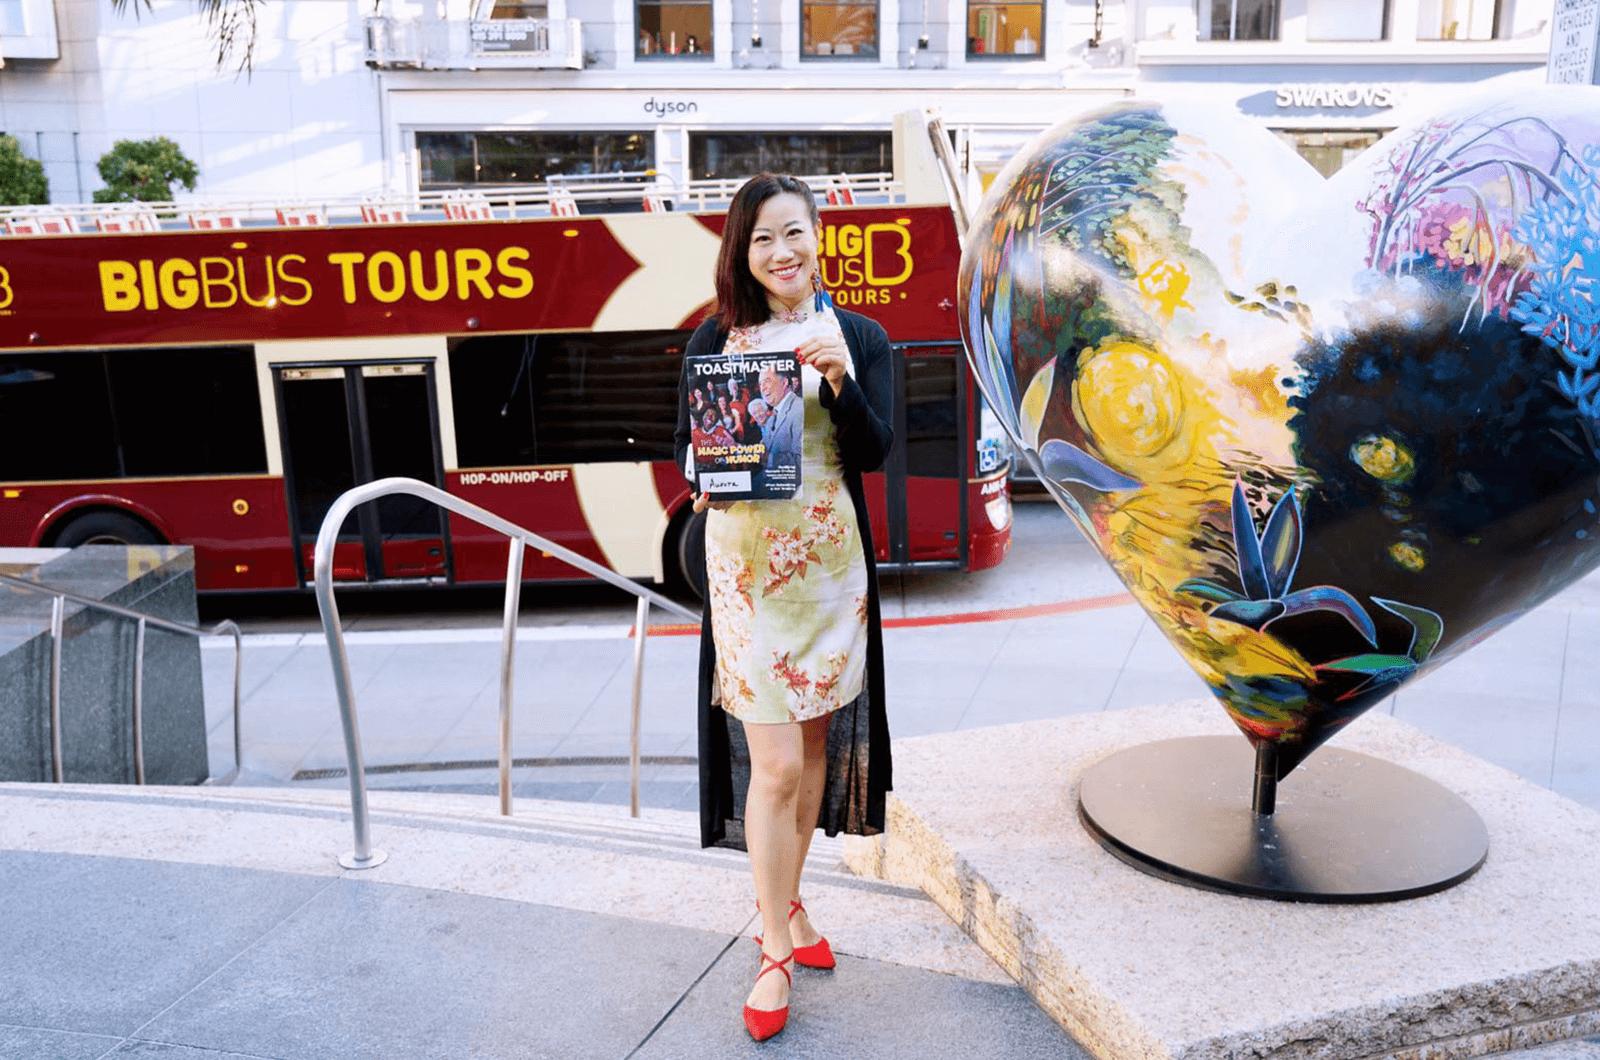 Aurora Zheng of Qingdao, Shandong, China, takes a photo alongside a heart sculpture in San Francisco's Union Square in California.